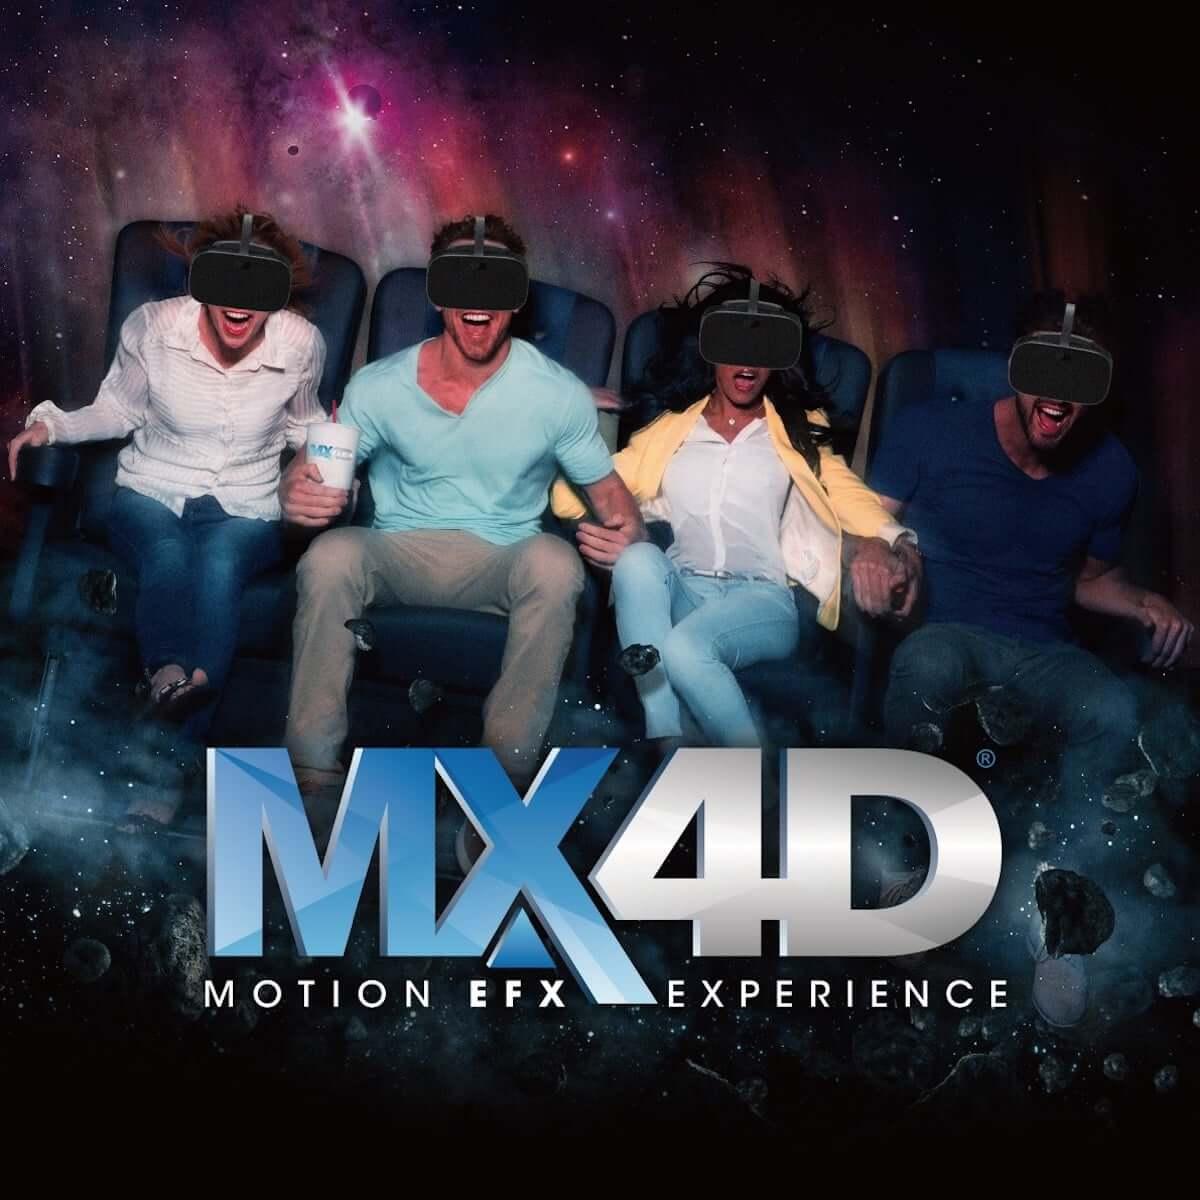 KOHH、新作アルバムをサプライズ・リリース!ワンオクTakaをフィーチャーした新作MVを世界初VR×MX4D®で上映開始 music190201-kohh-4-1200x1200